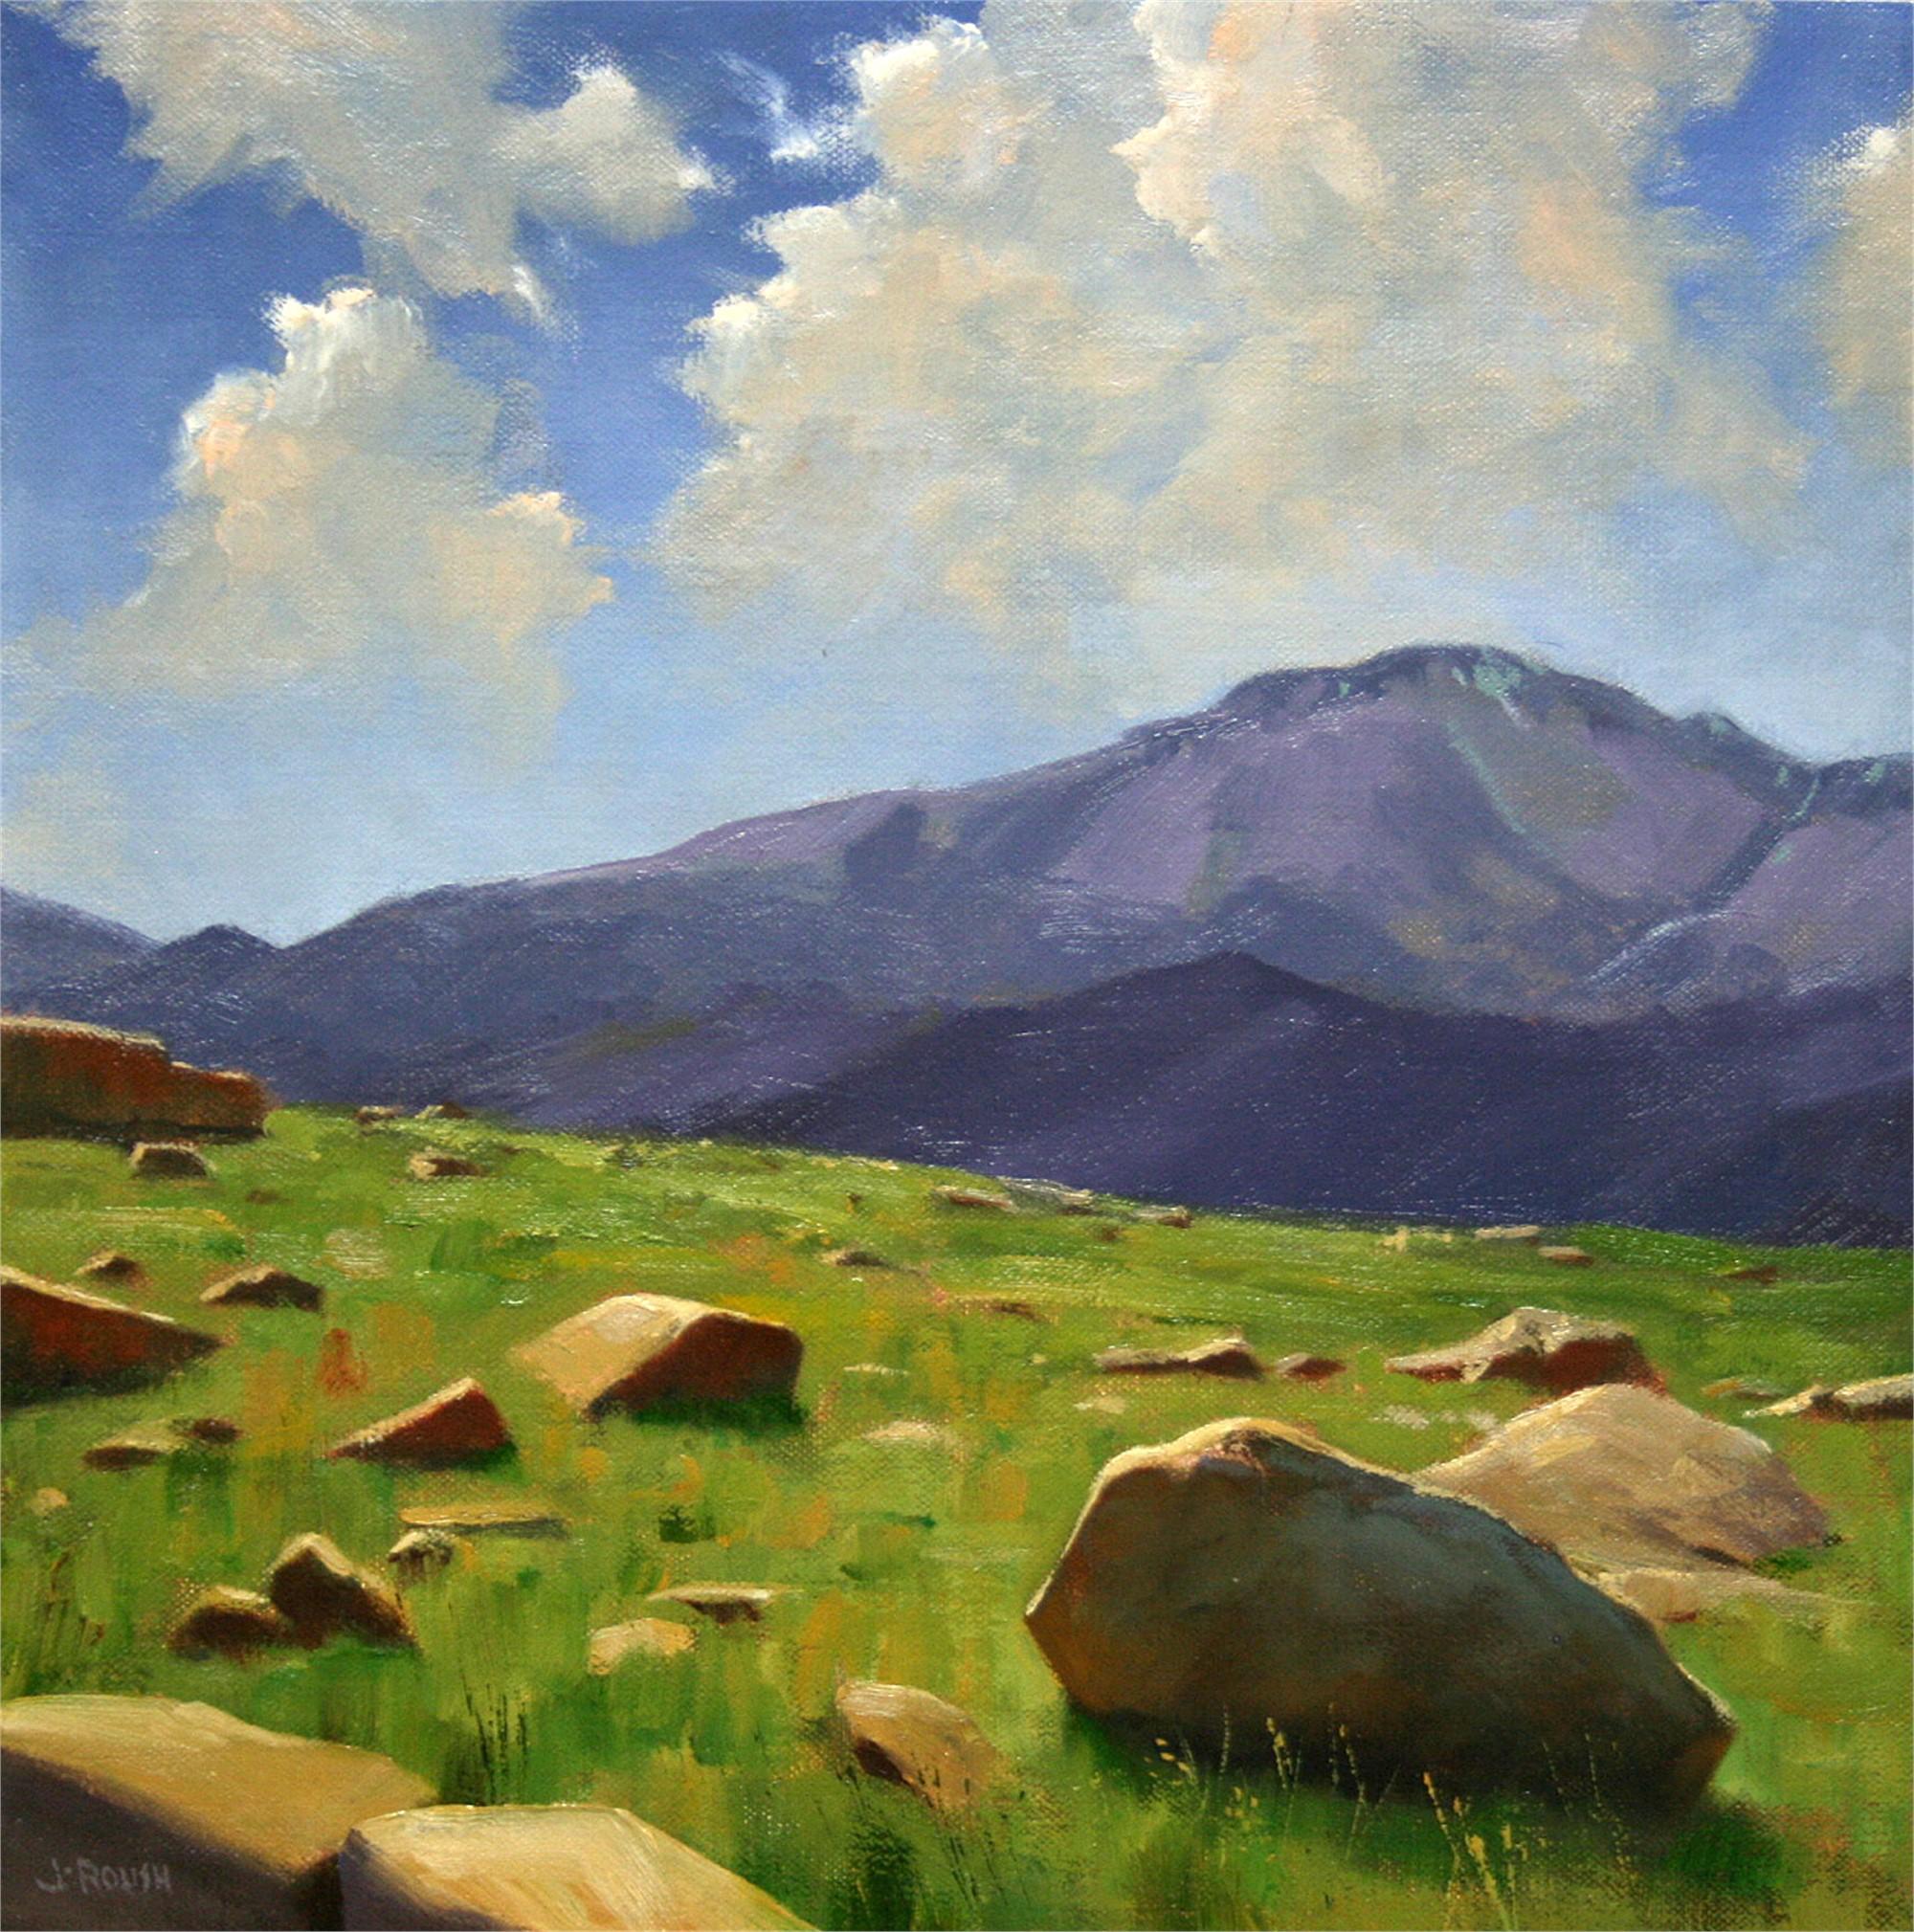 Rock Garden by John Roush